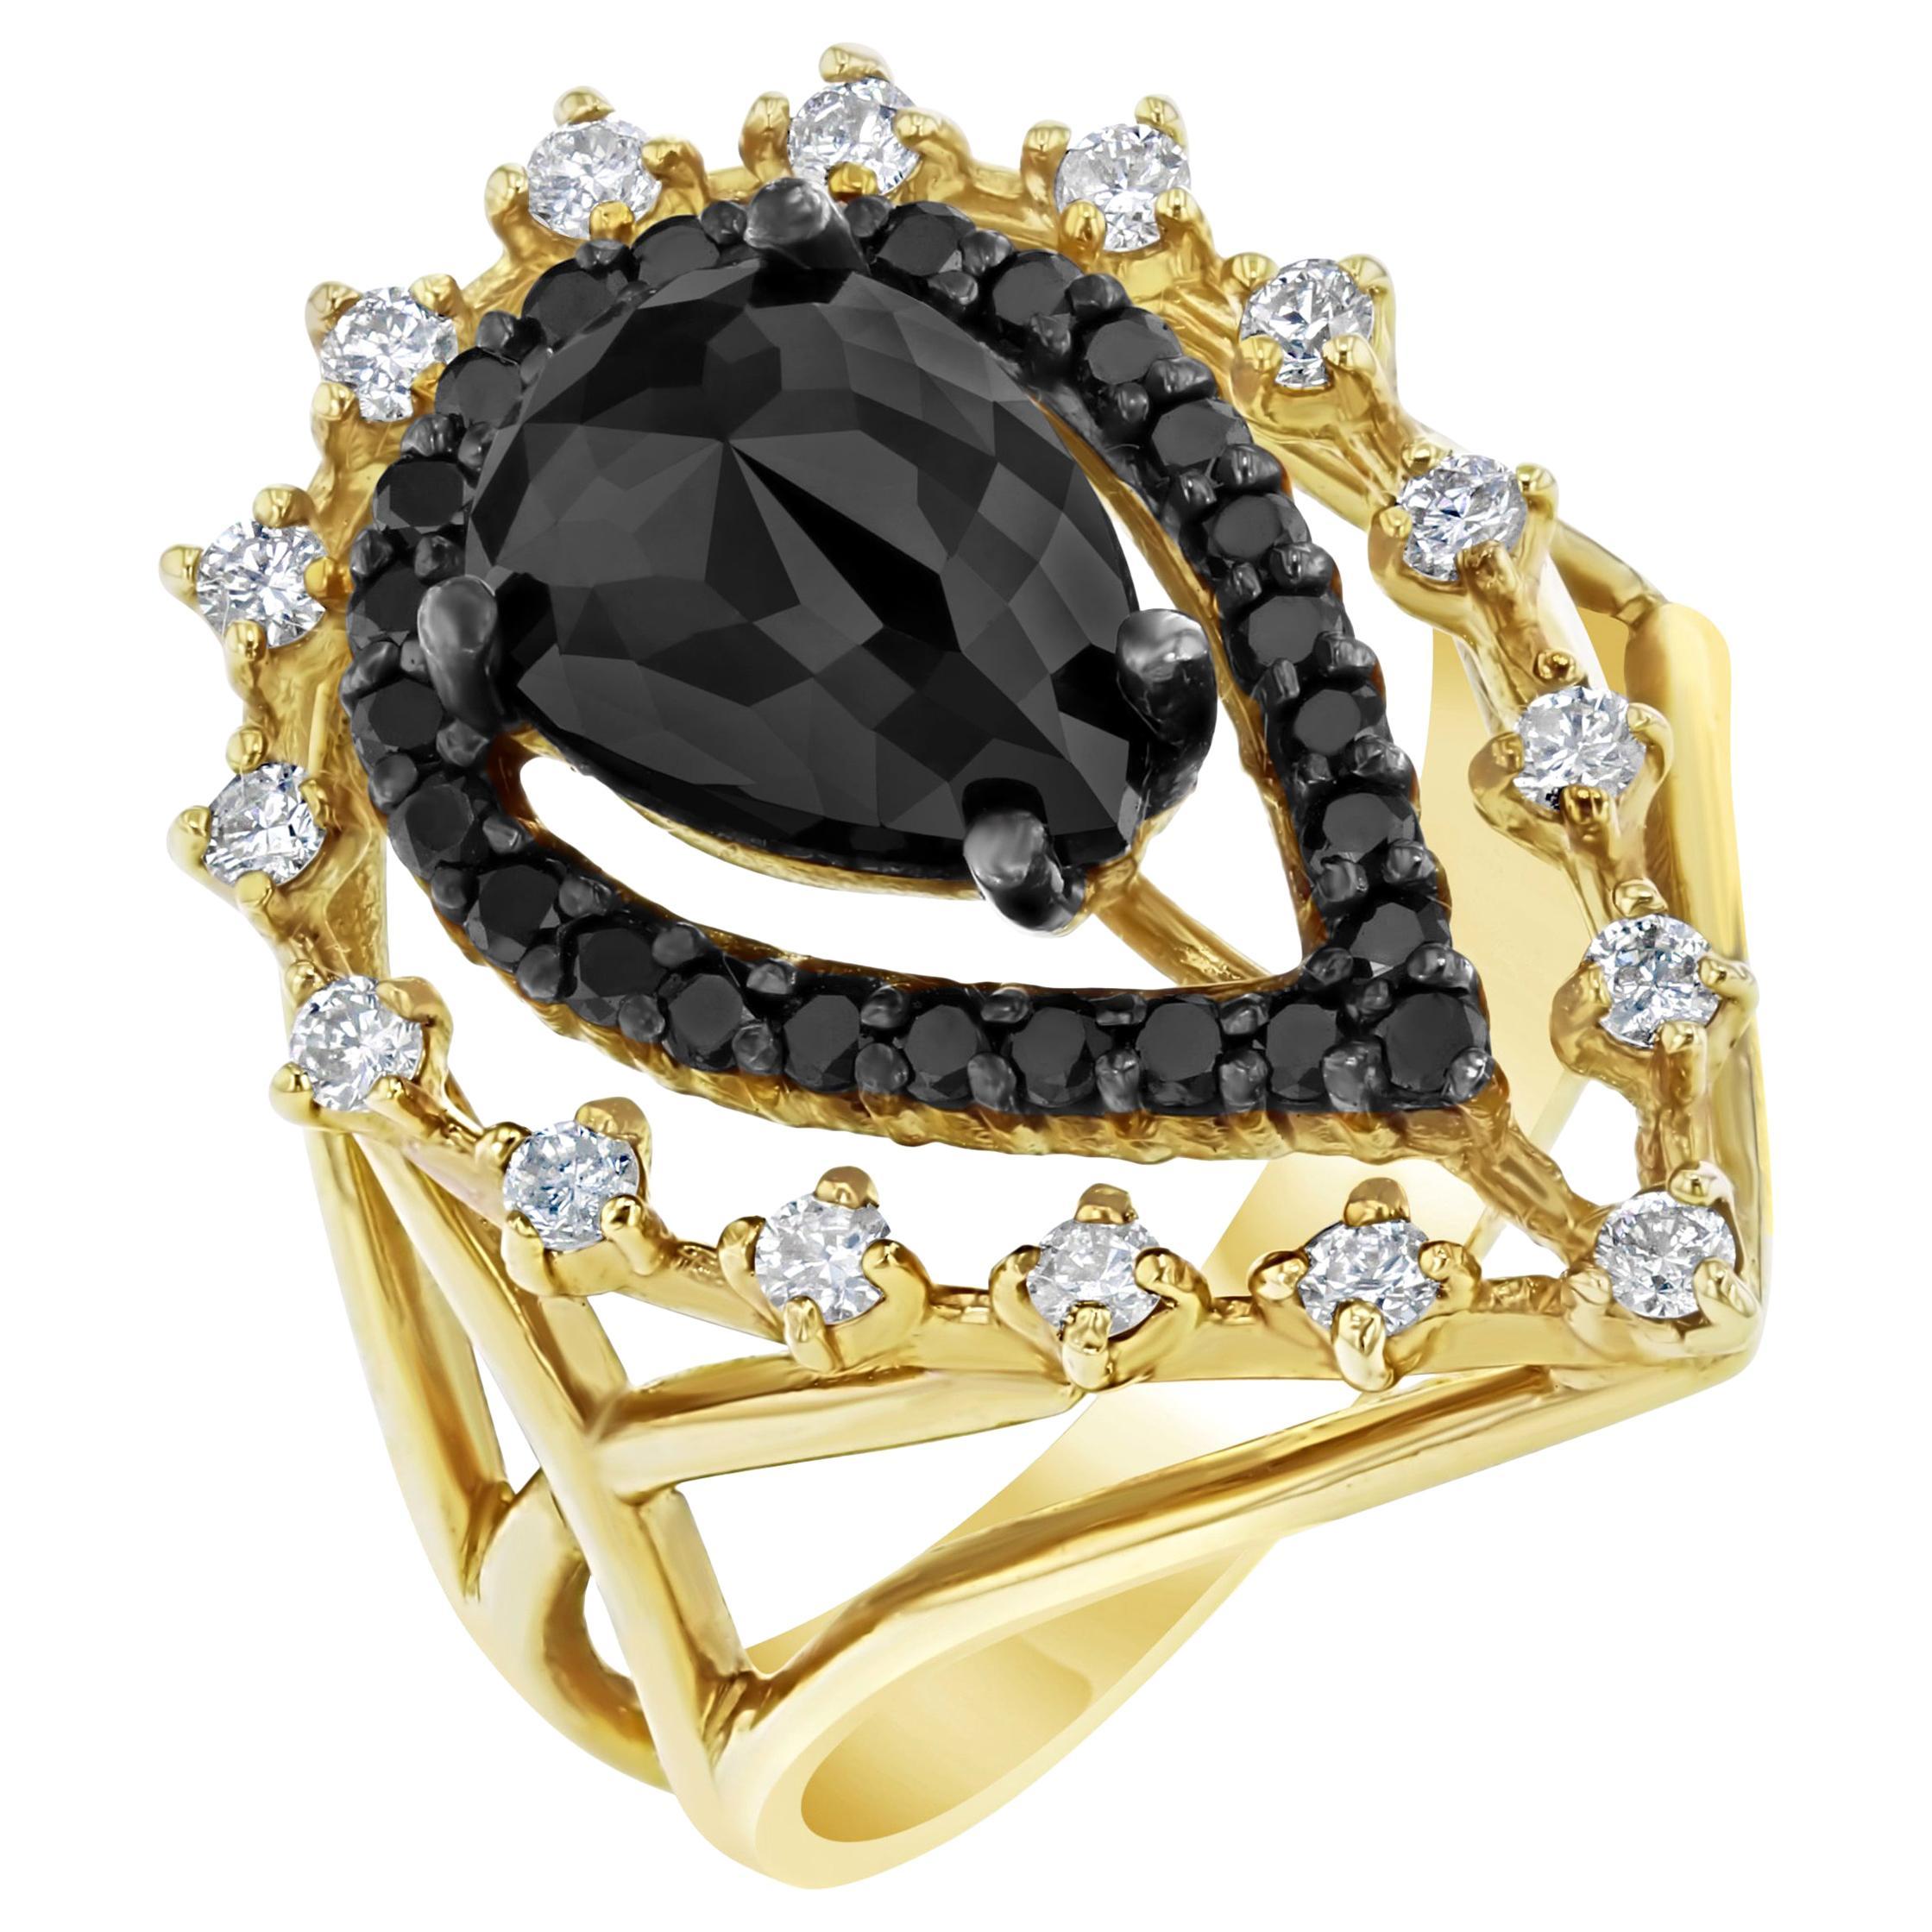 2.86 Carat Pear Cut Black Diamond Yellow Gold Cocktail Ring